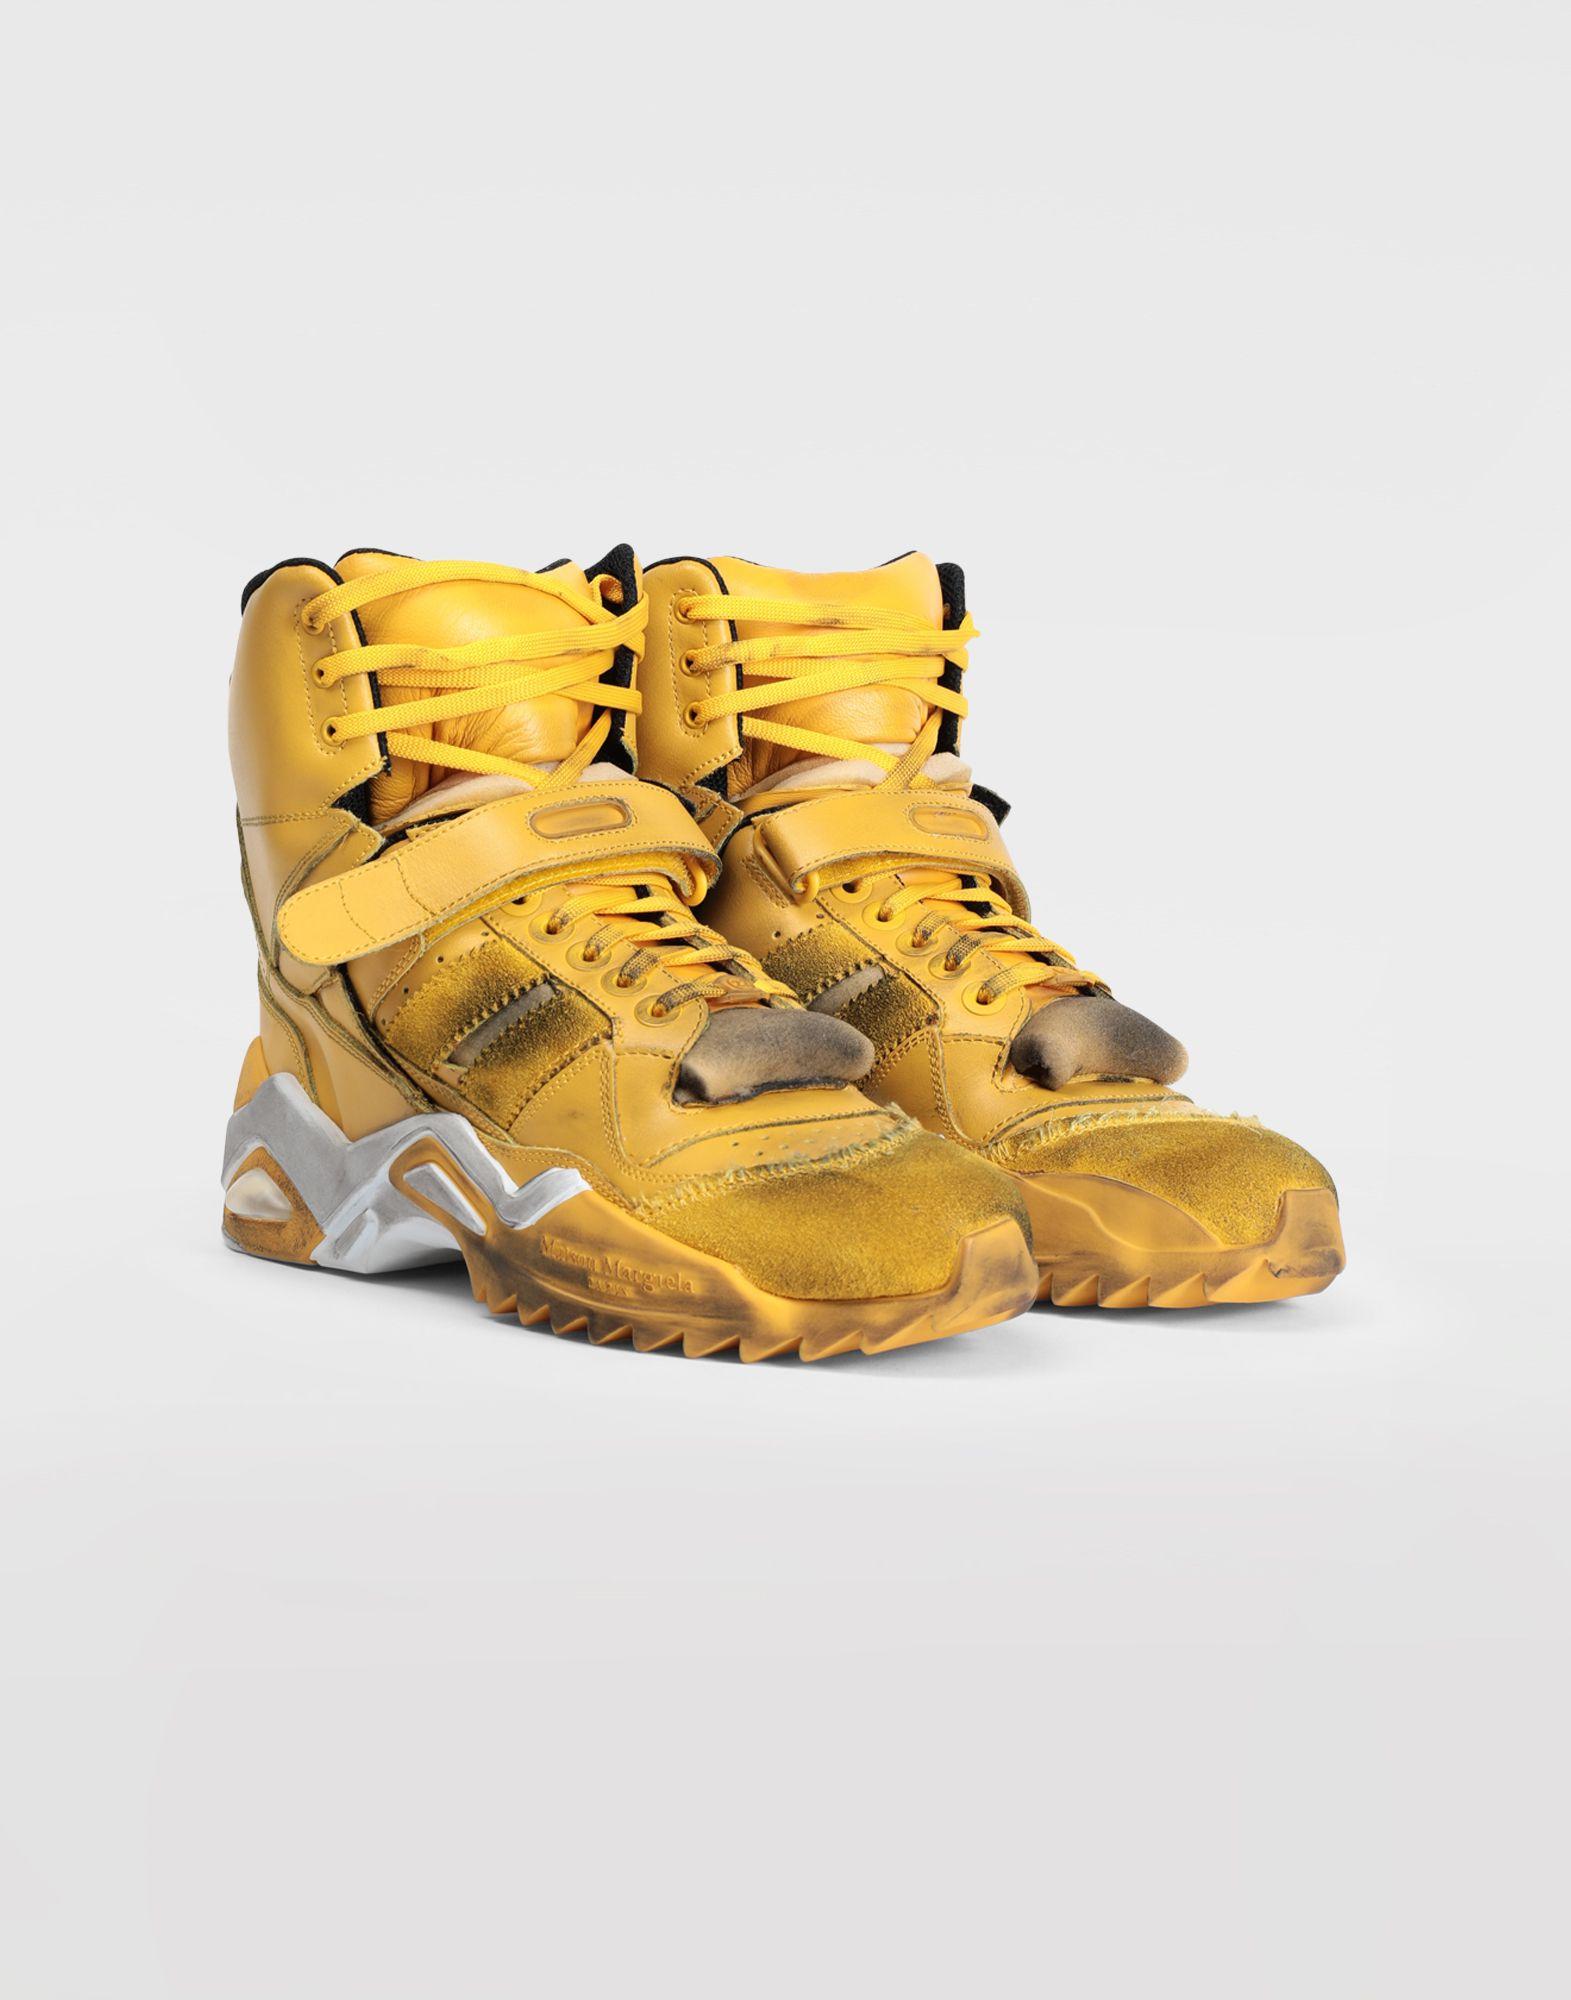 MAISON MARGIELA High-top 'Retro Fit' sneakers Sneakers Woman d